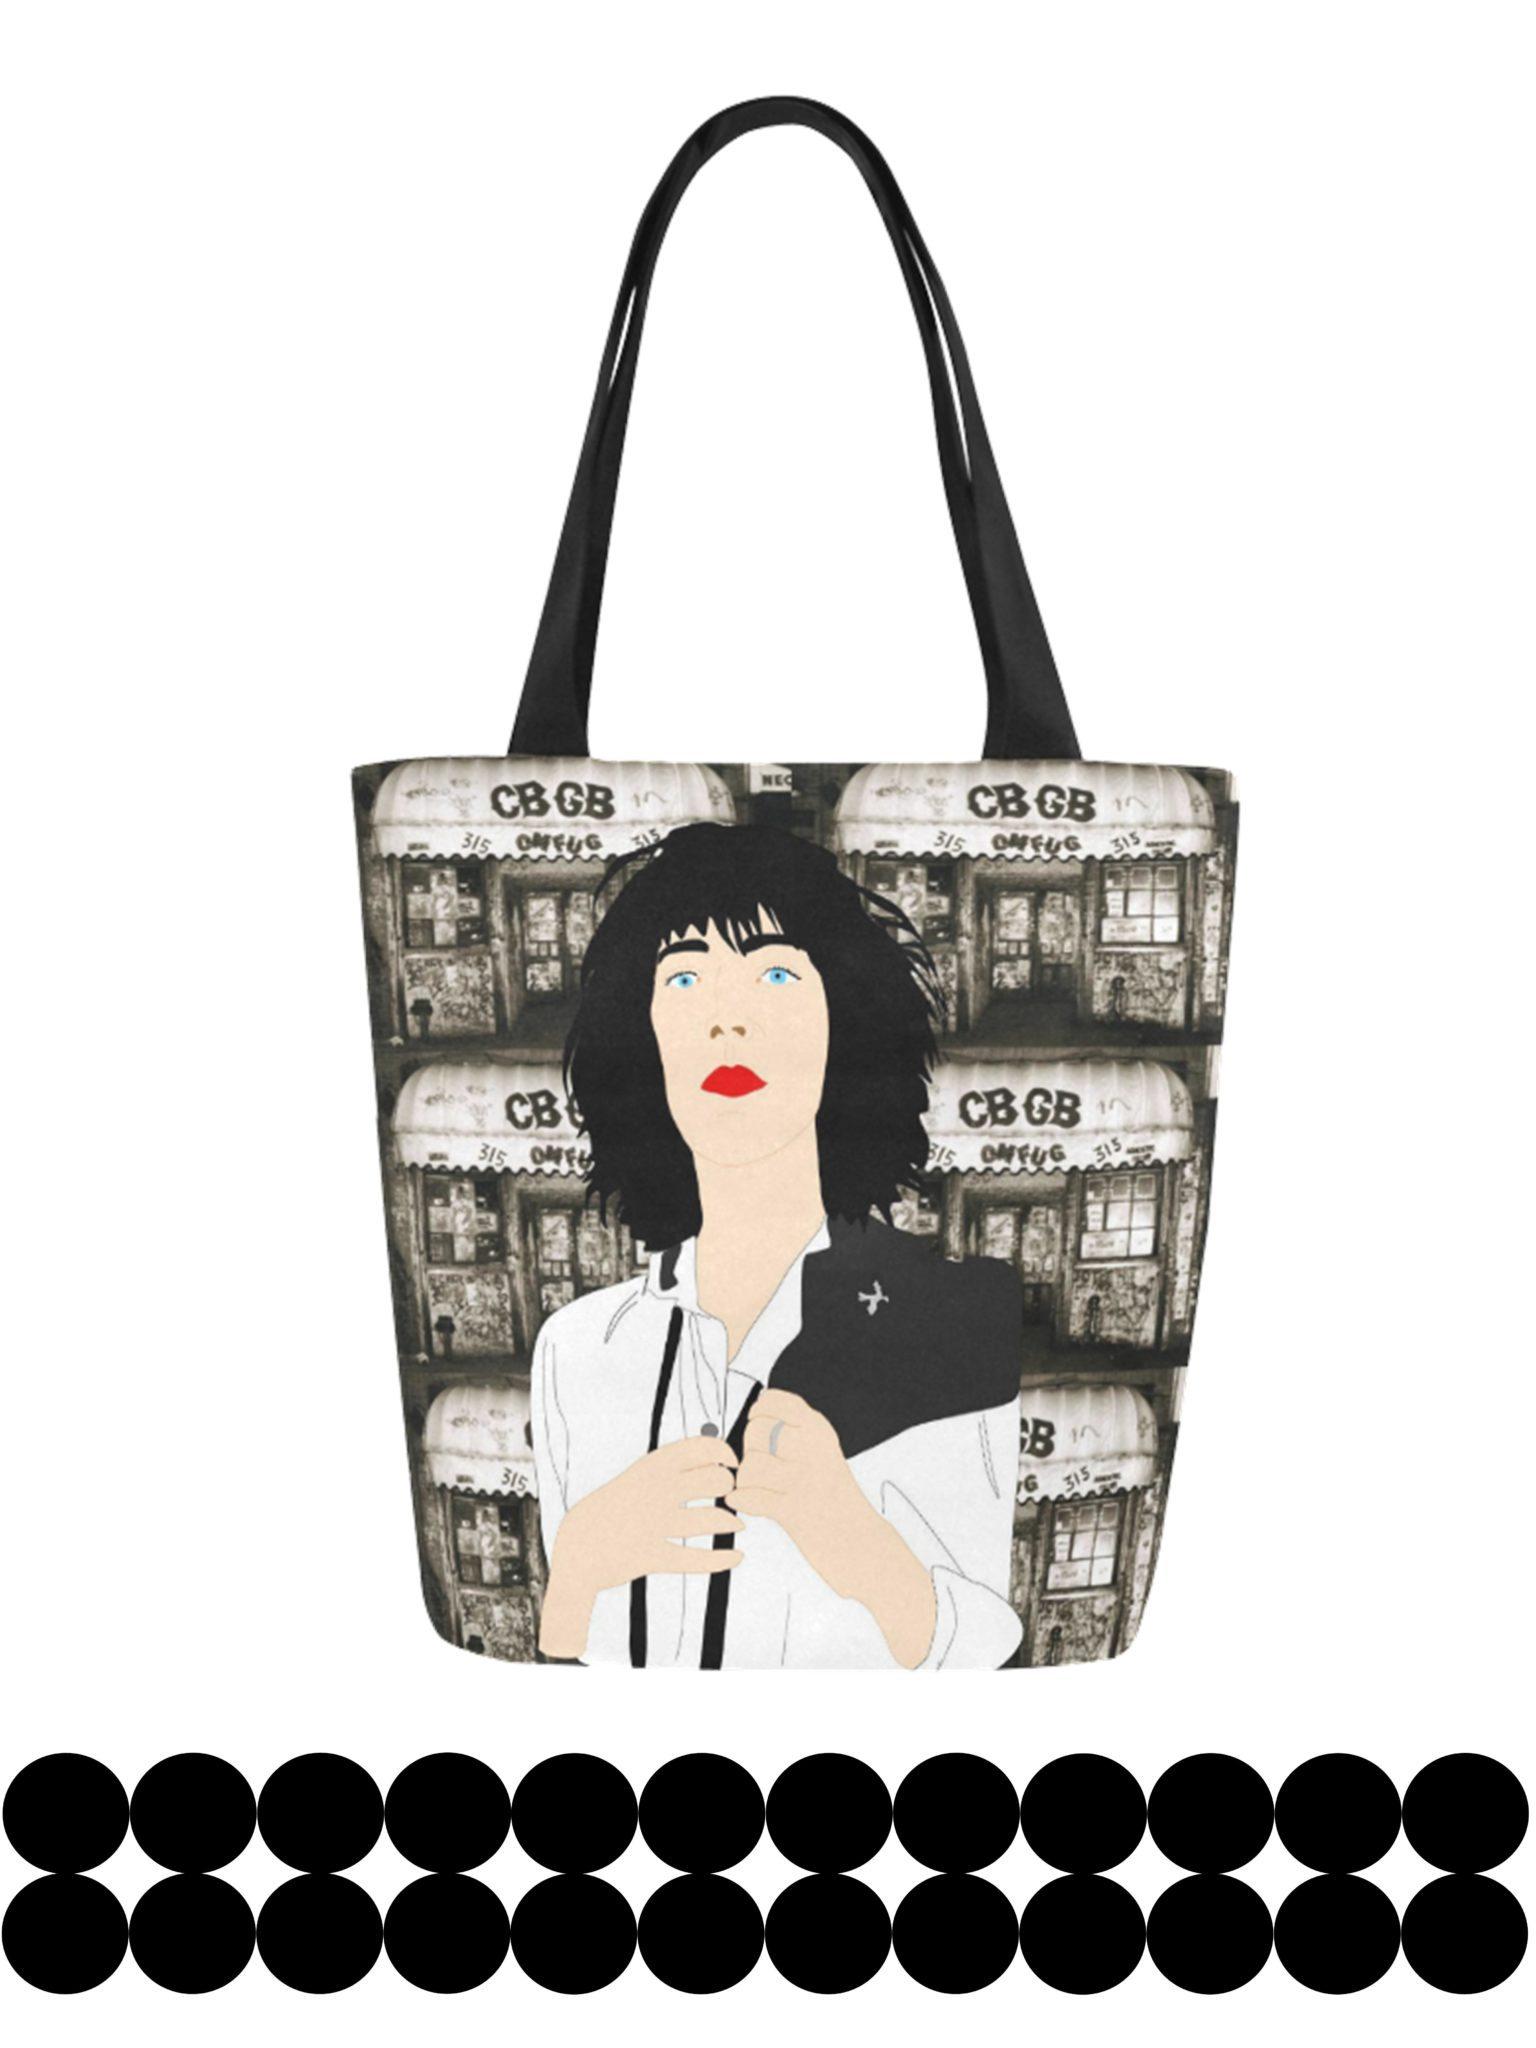 patti smith canvas tote bag original illustration kayci garline wheatley. Black Bedroom Furniture Sets. Home Design Ideas